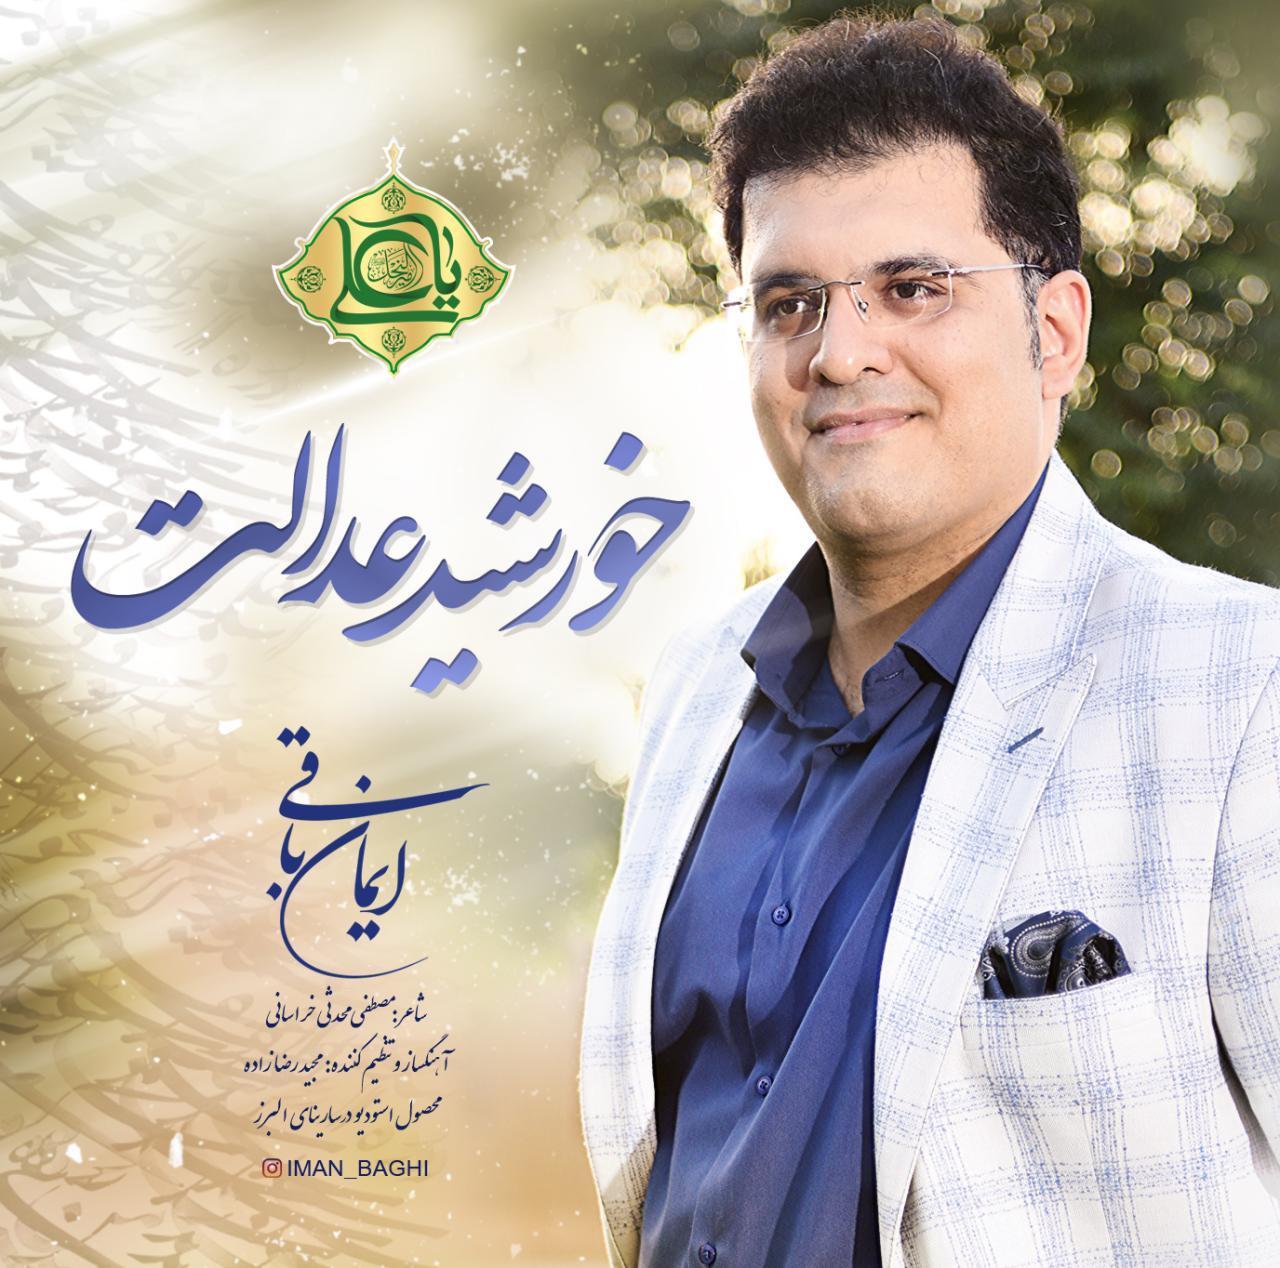 Iman Baghi – Khorshide Edalat